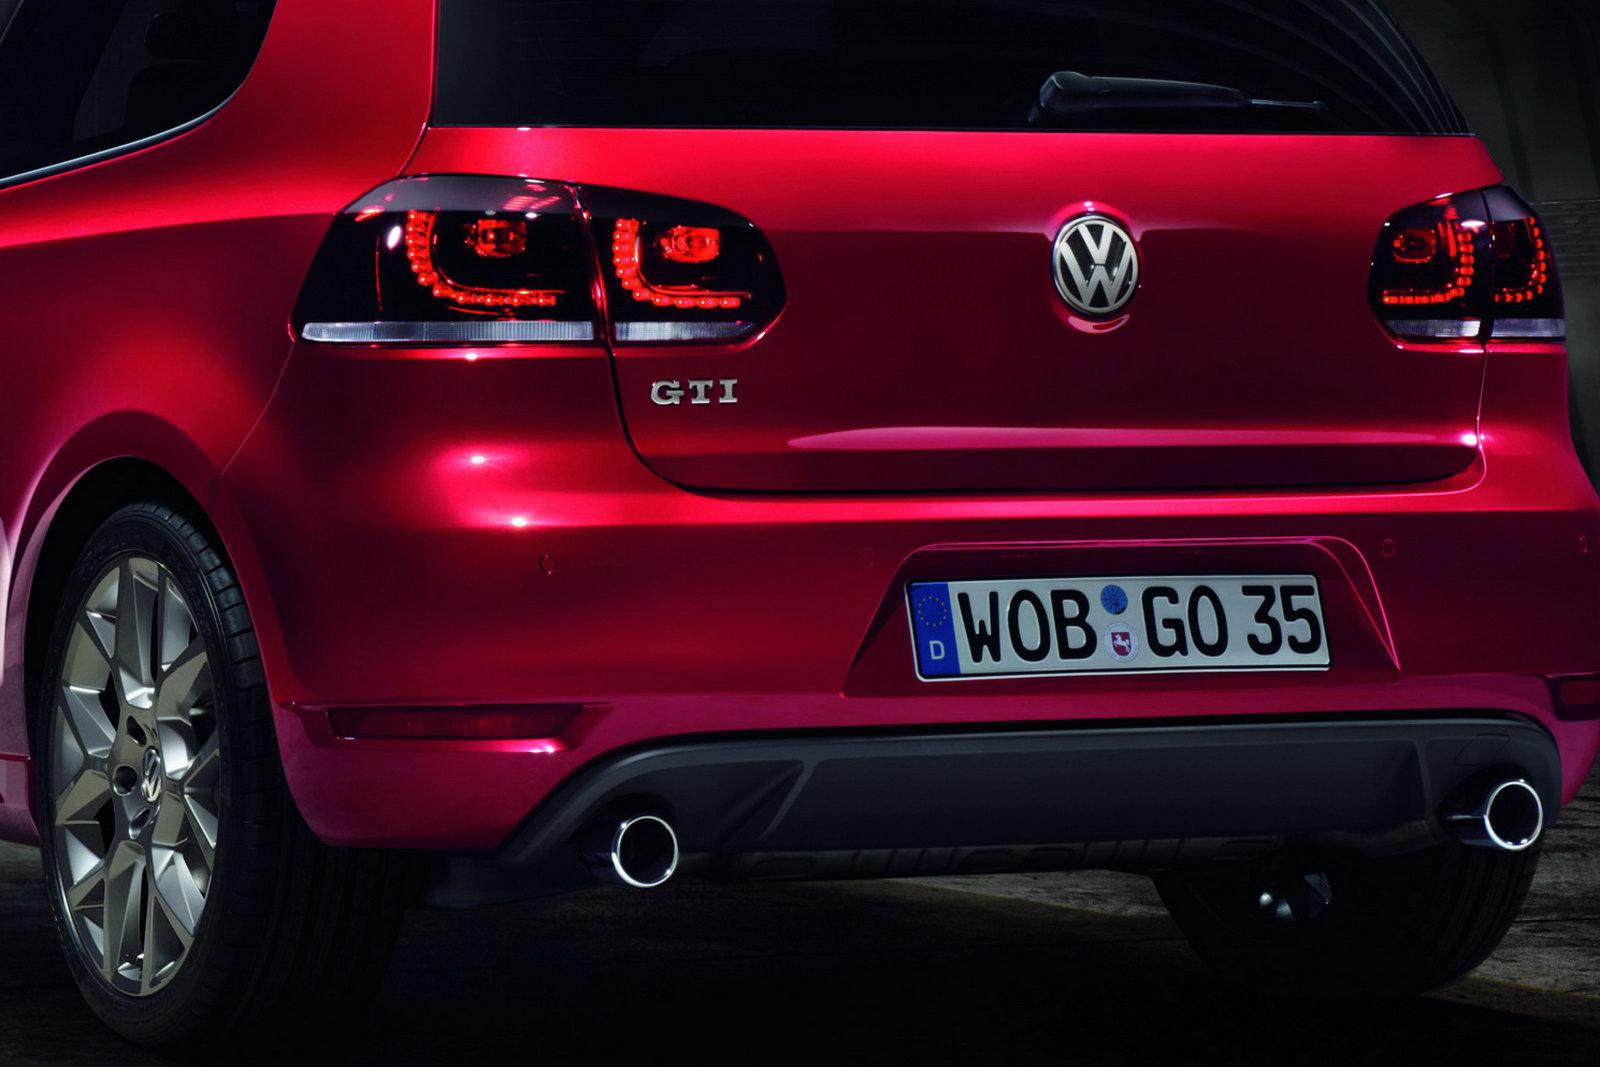 VW Golf GTI Edition 35 image #8